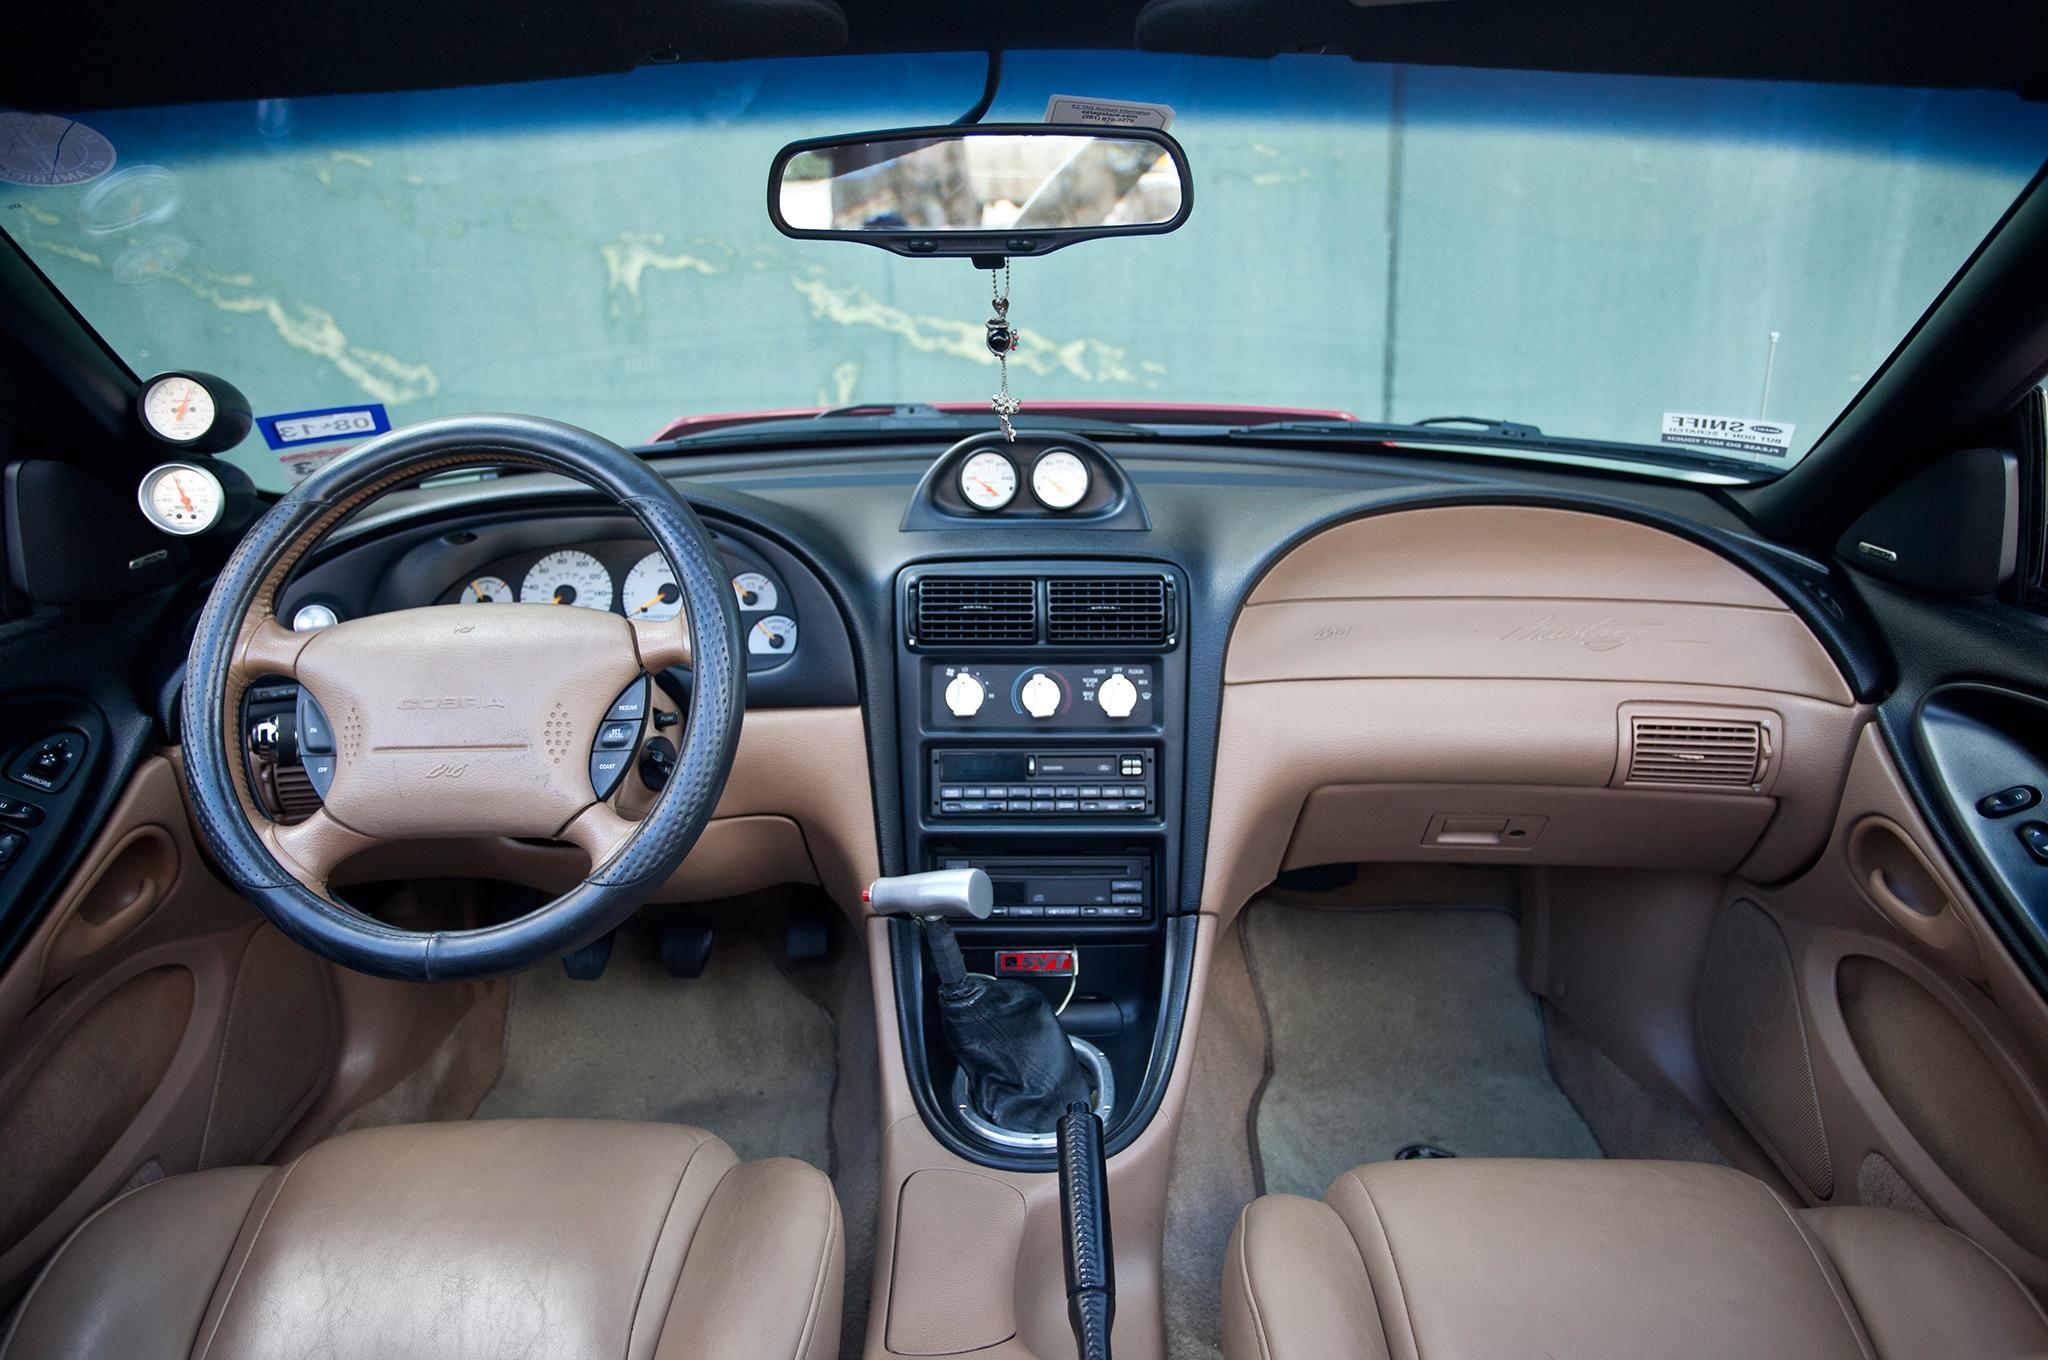 1994 Ford Mustang Interior 2